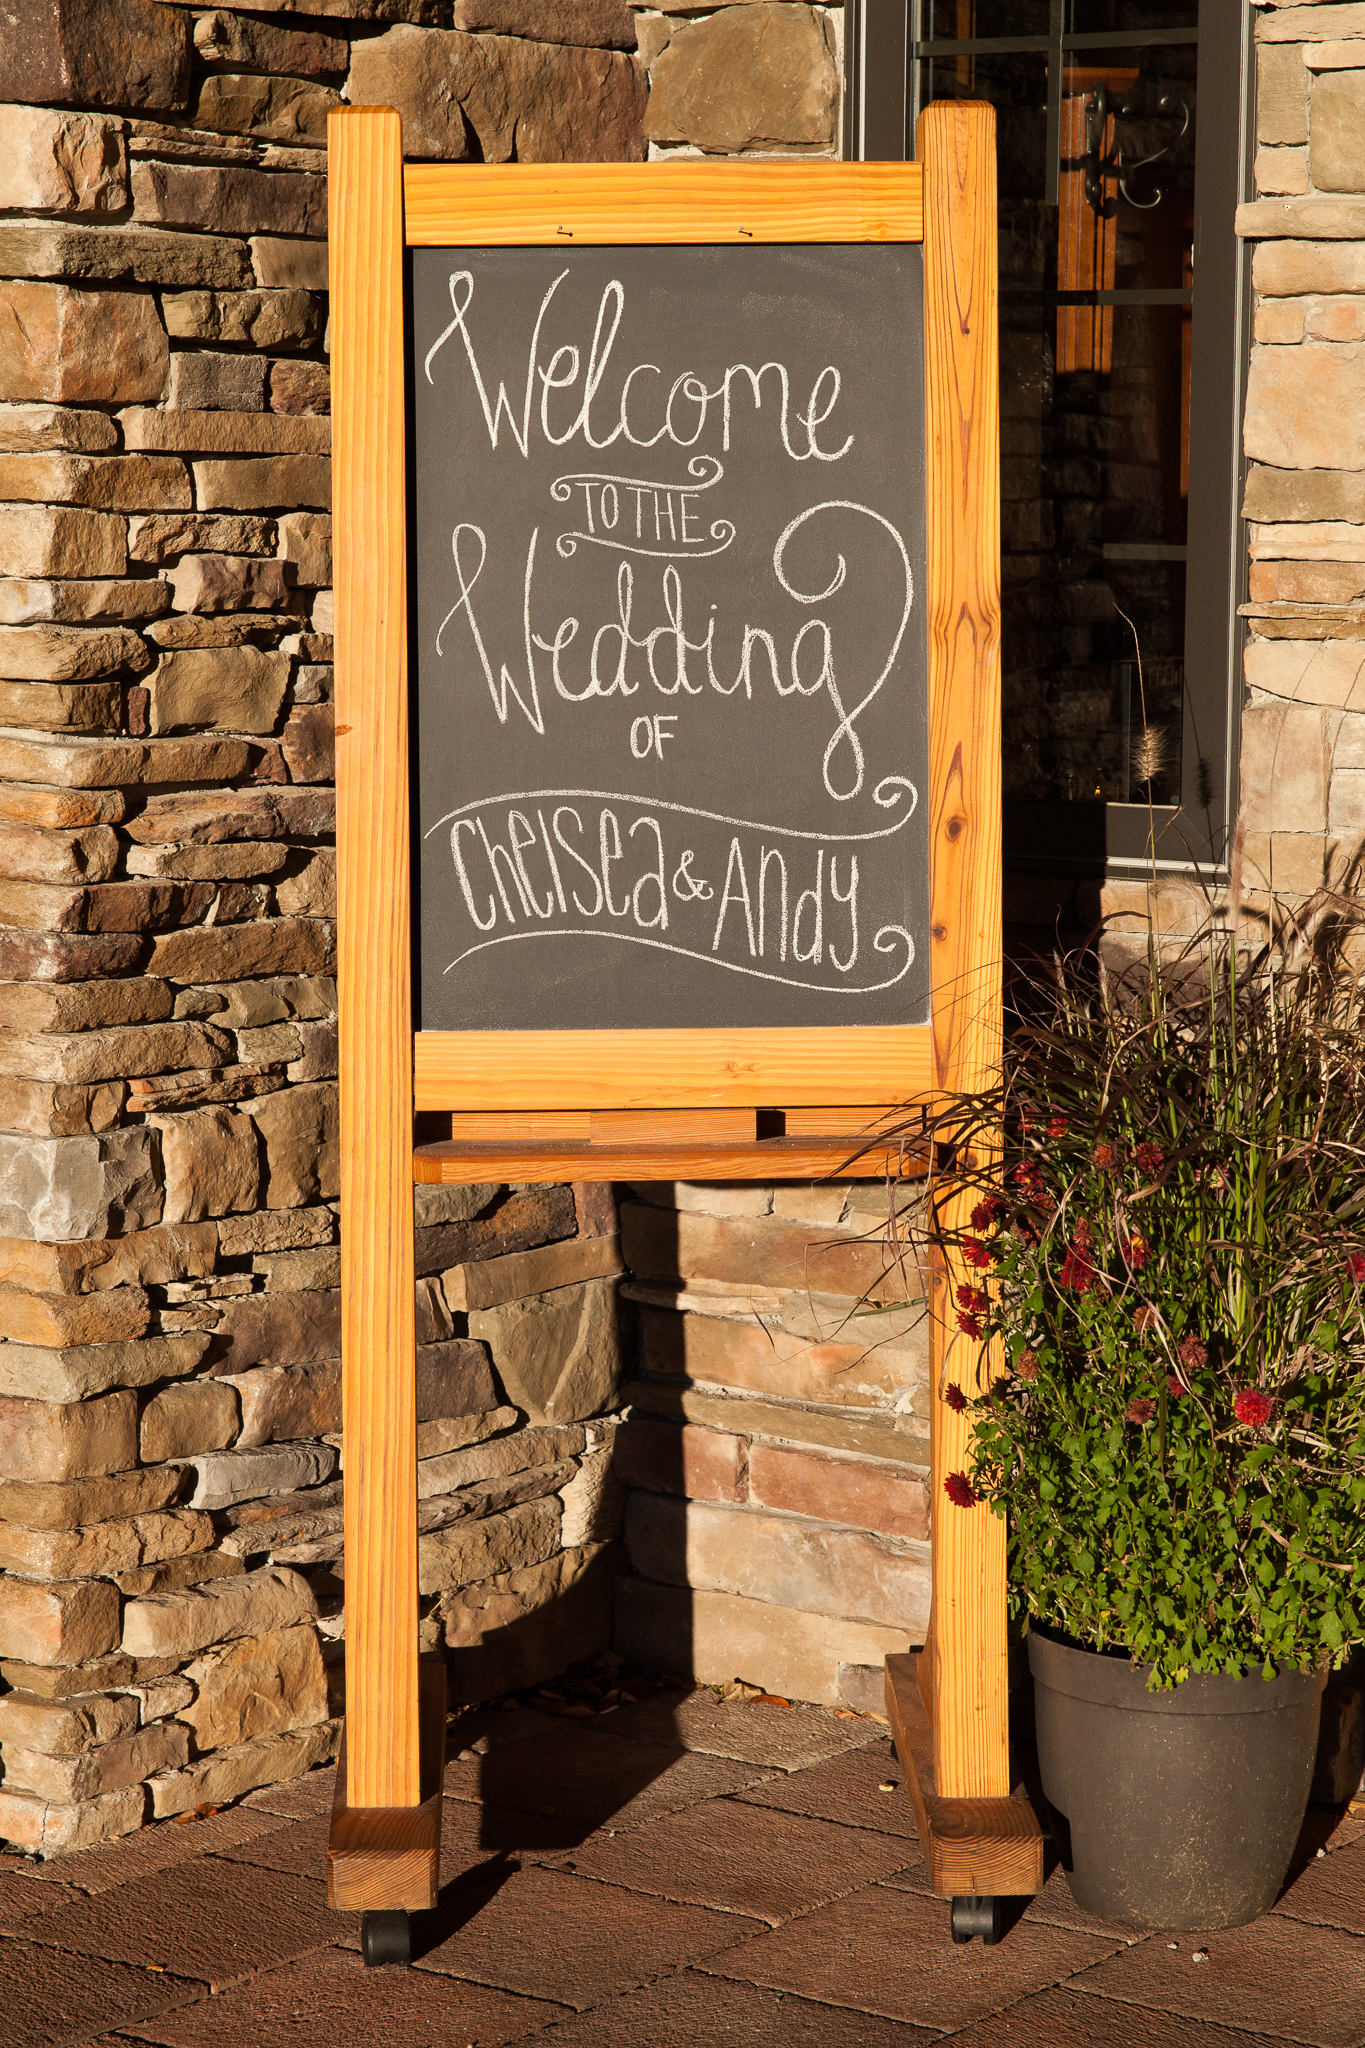 camuglia-whomstudio-chelsea_and_andy-nycphotographer-wedding-brooklyn-buffalo-timberlodge-045-0311.jpg